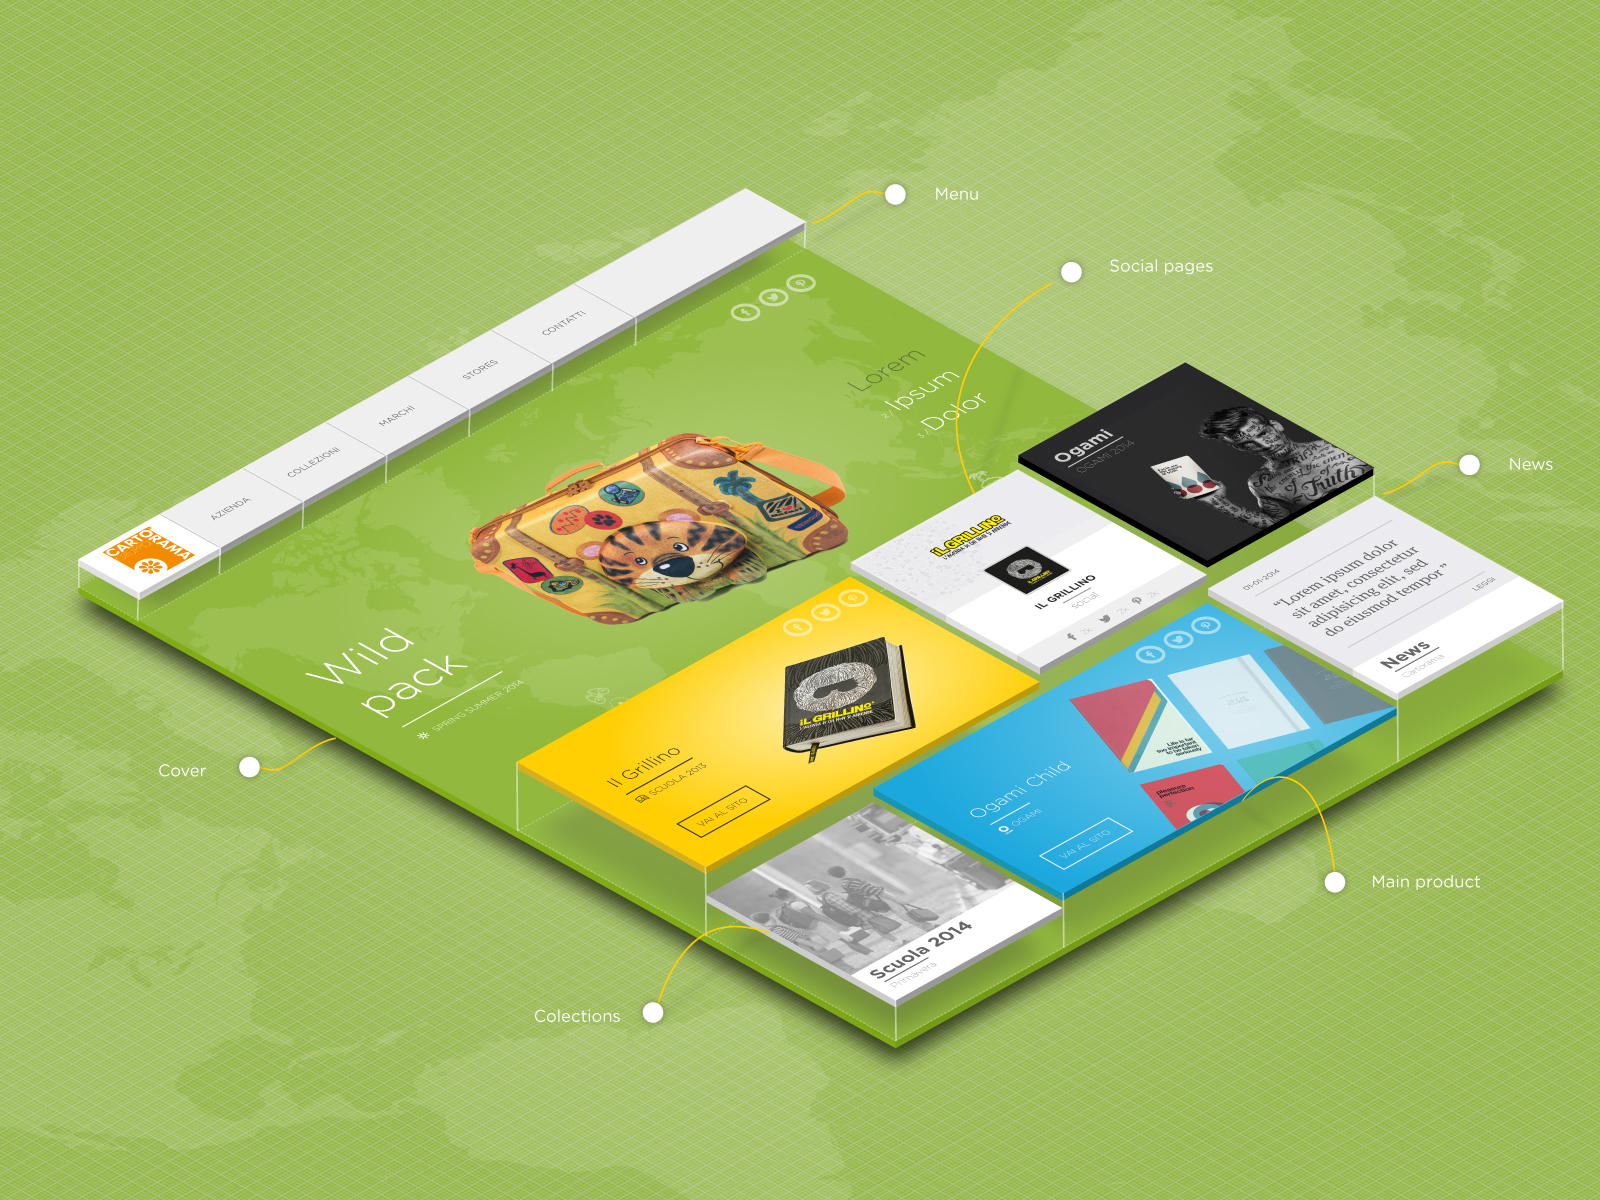 HomePage-image-cartorama